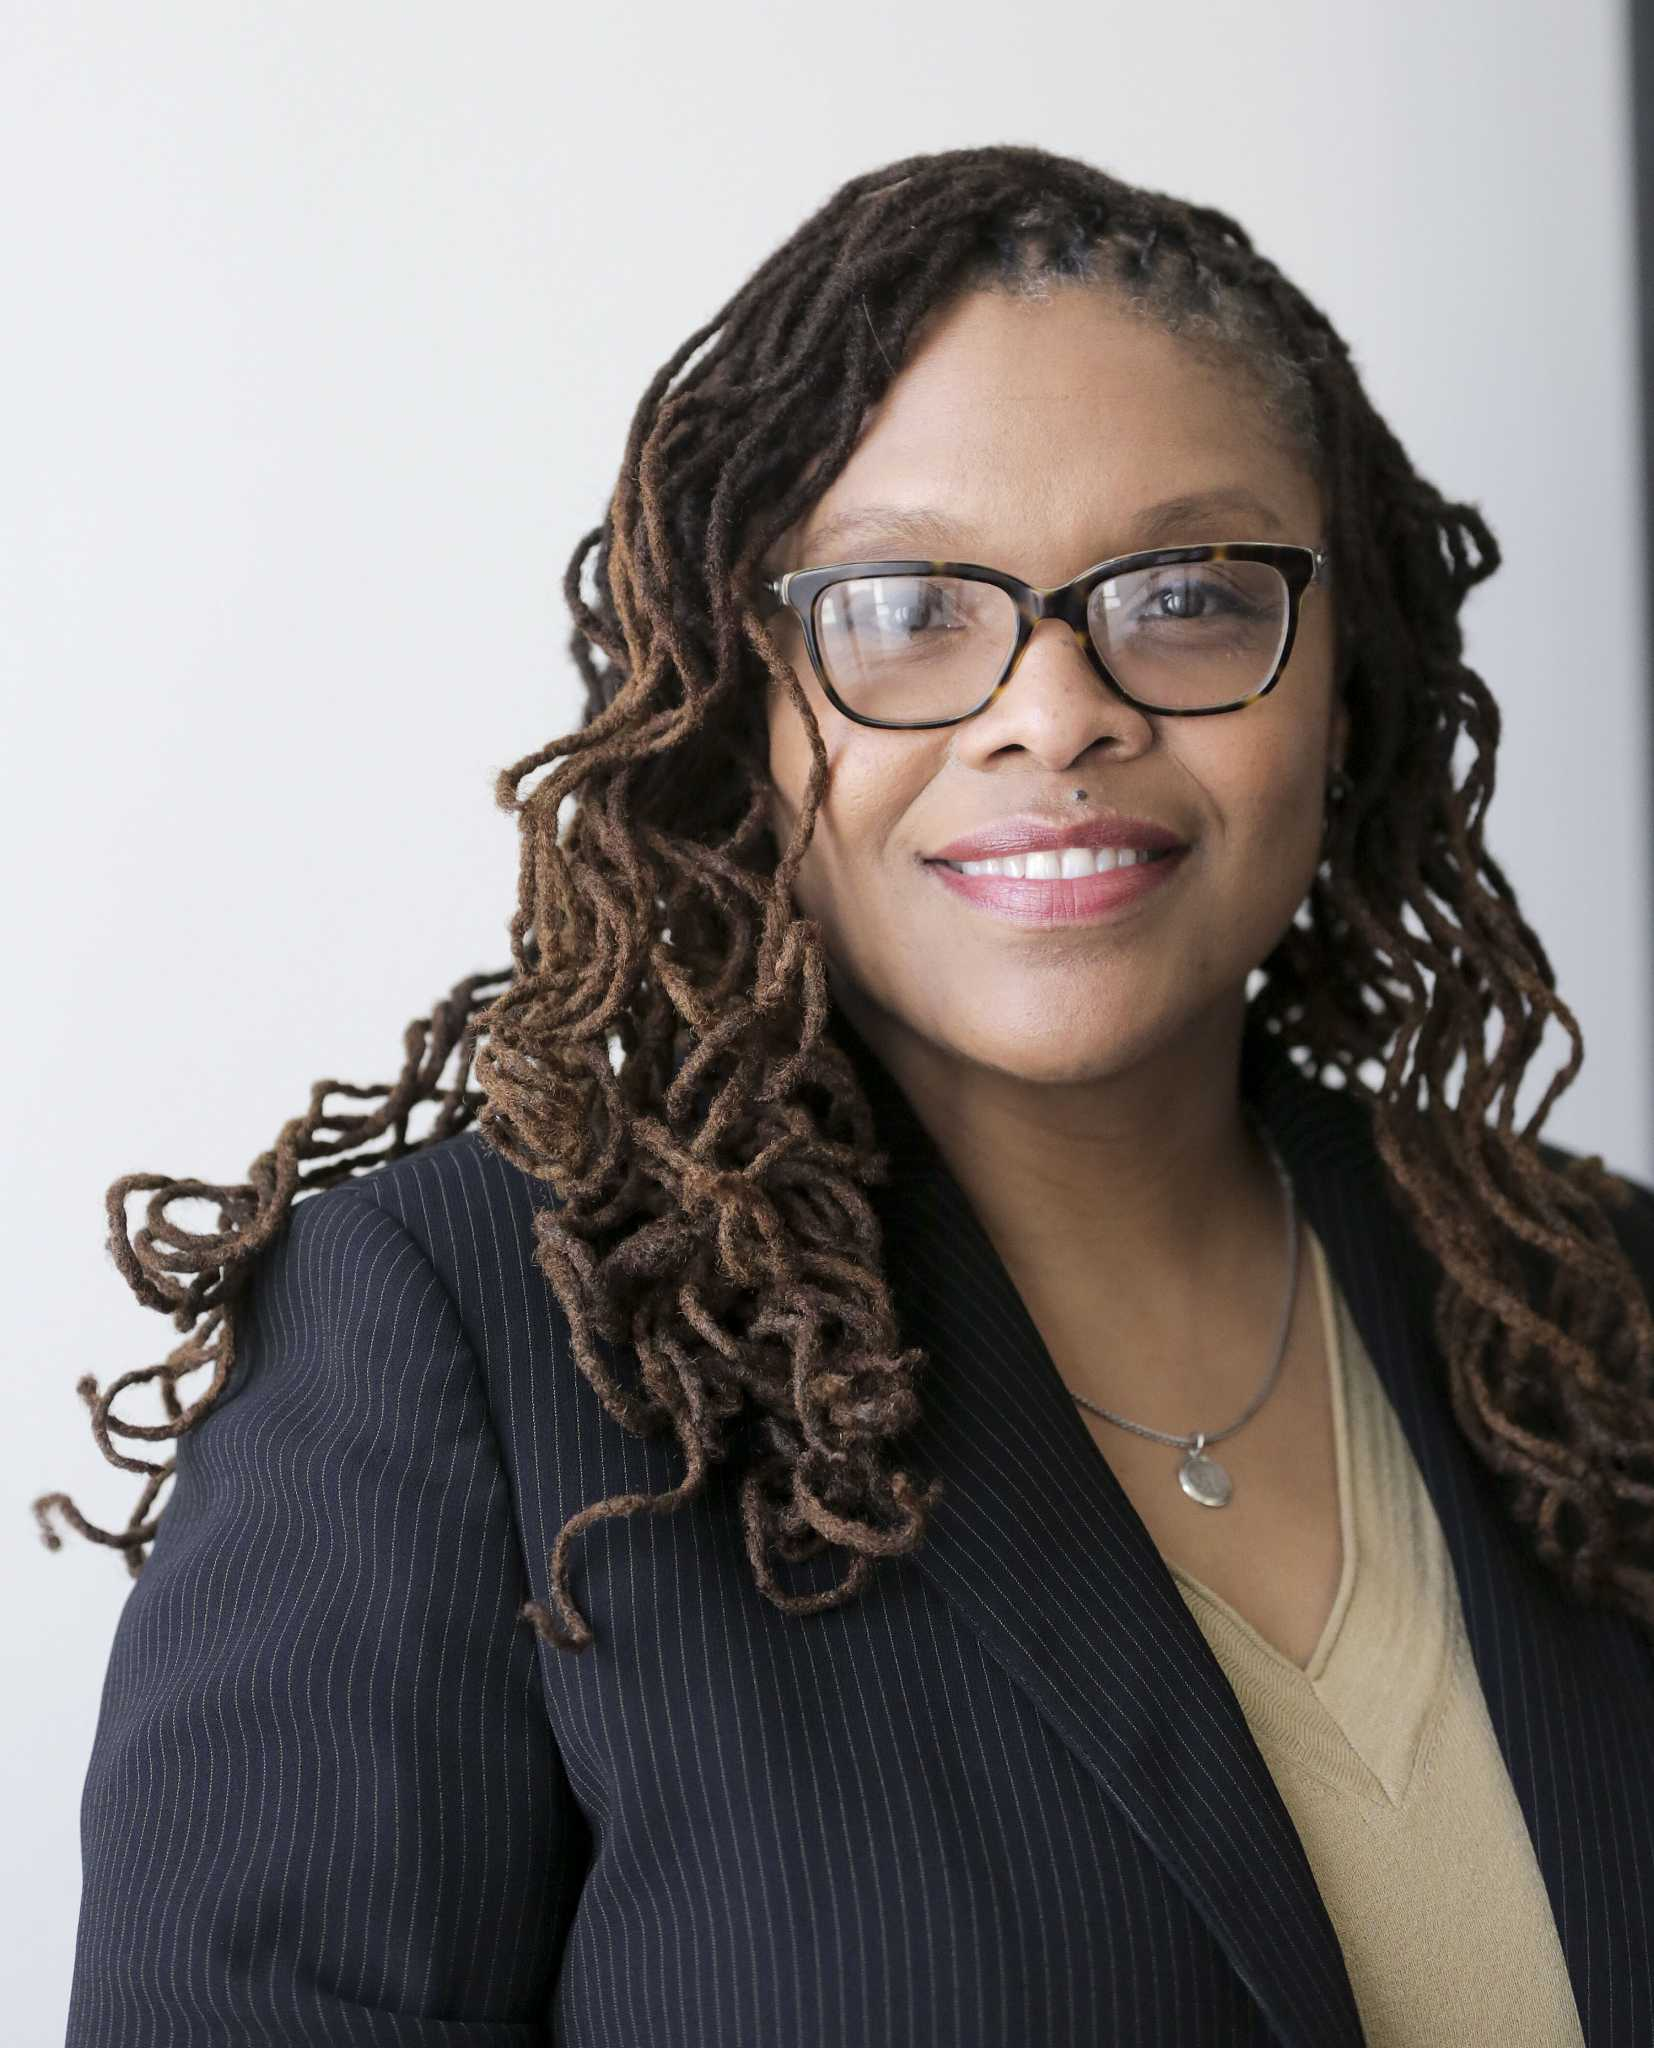 For County Criminal Court No. 4: Shannon Baldwin